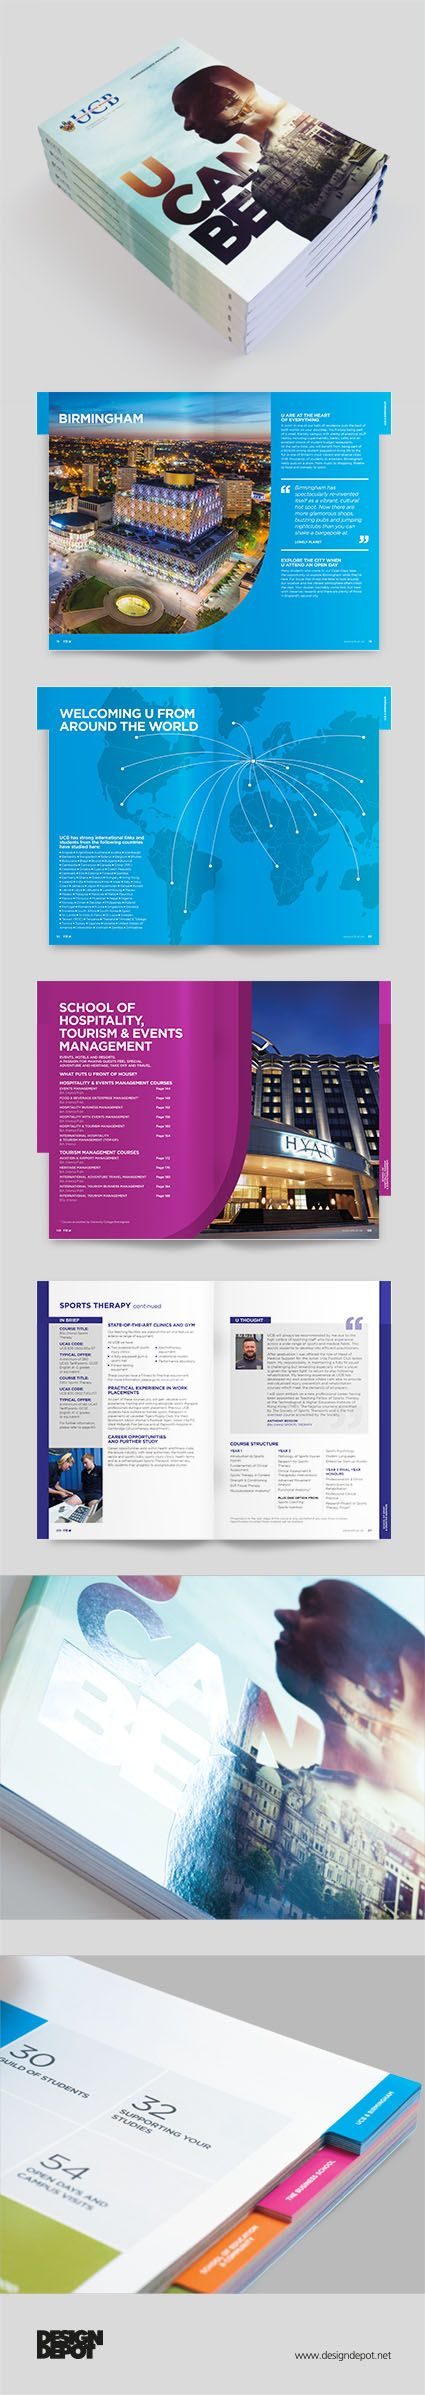 University College Birmingham prospectus, artwork, Birmingham, university, identity, branding, design depot, prospectus, education, graphics, Northamptonshire #DesignDepot